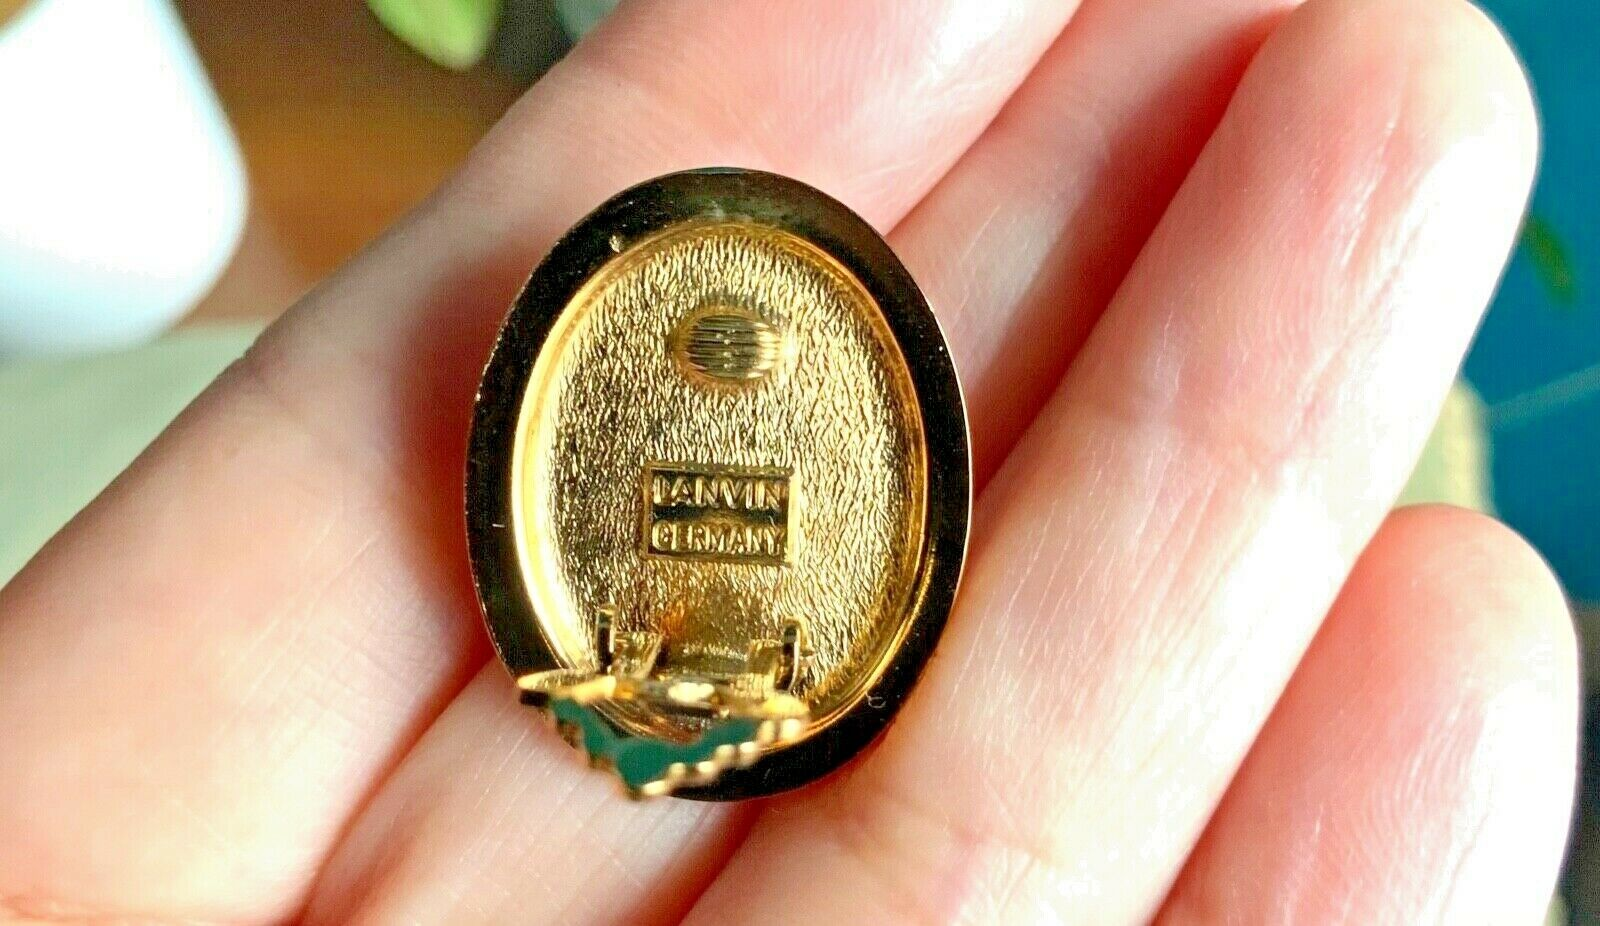 VINTAGE LANVIN CABOCHON EARRINGS BLACK STONE GOLD… - image 3